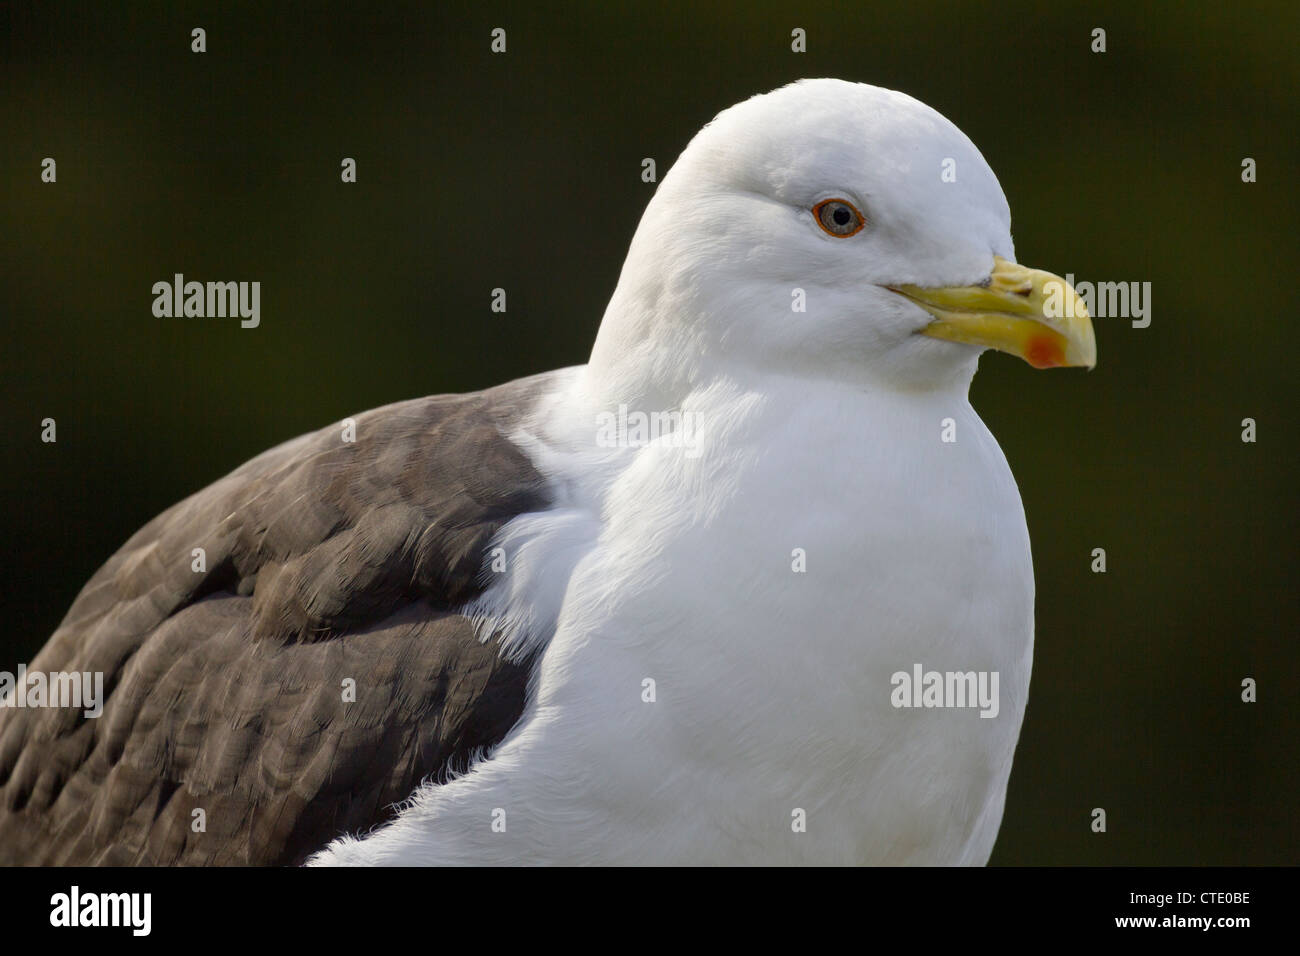 Black-backed seagull at Whangarei, New Zealand - Stock Image